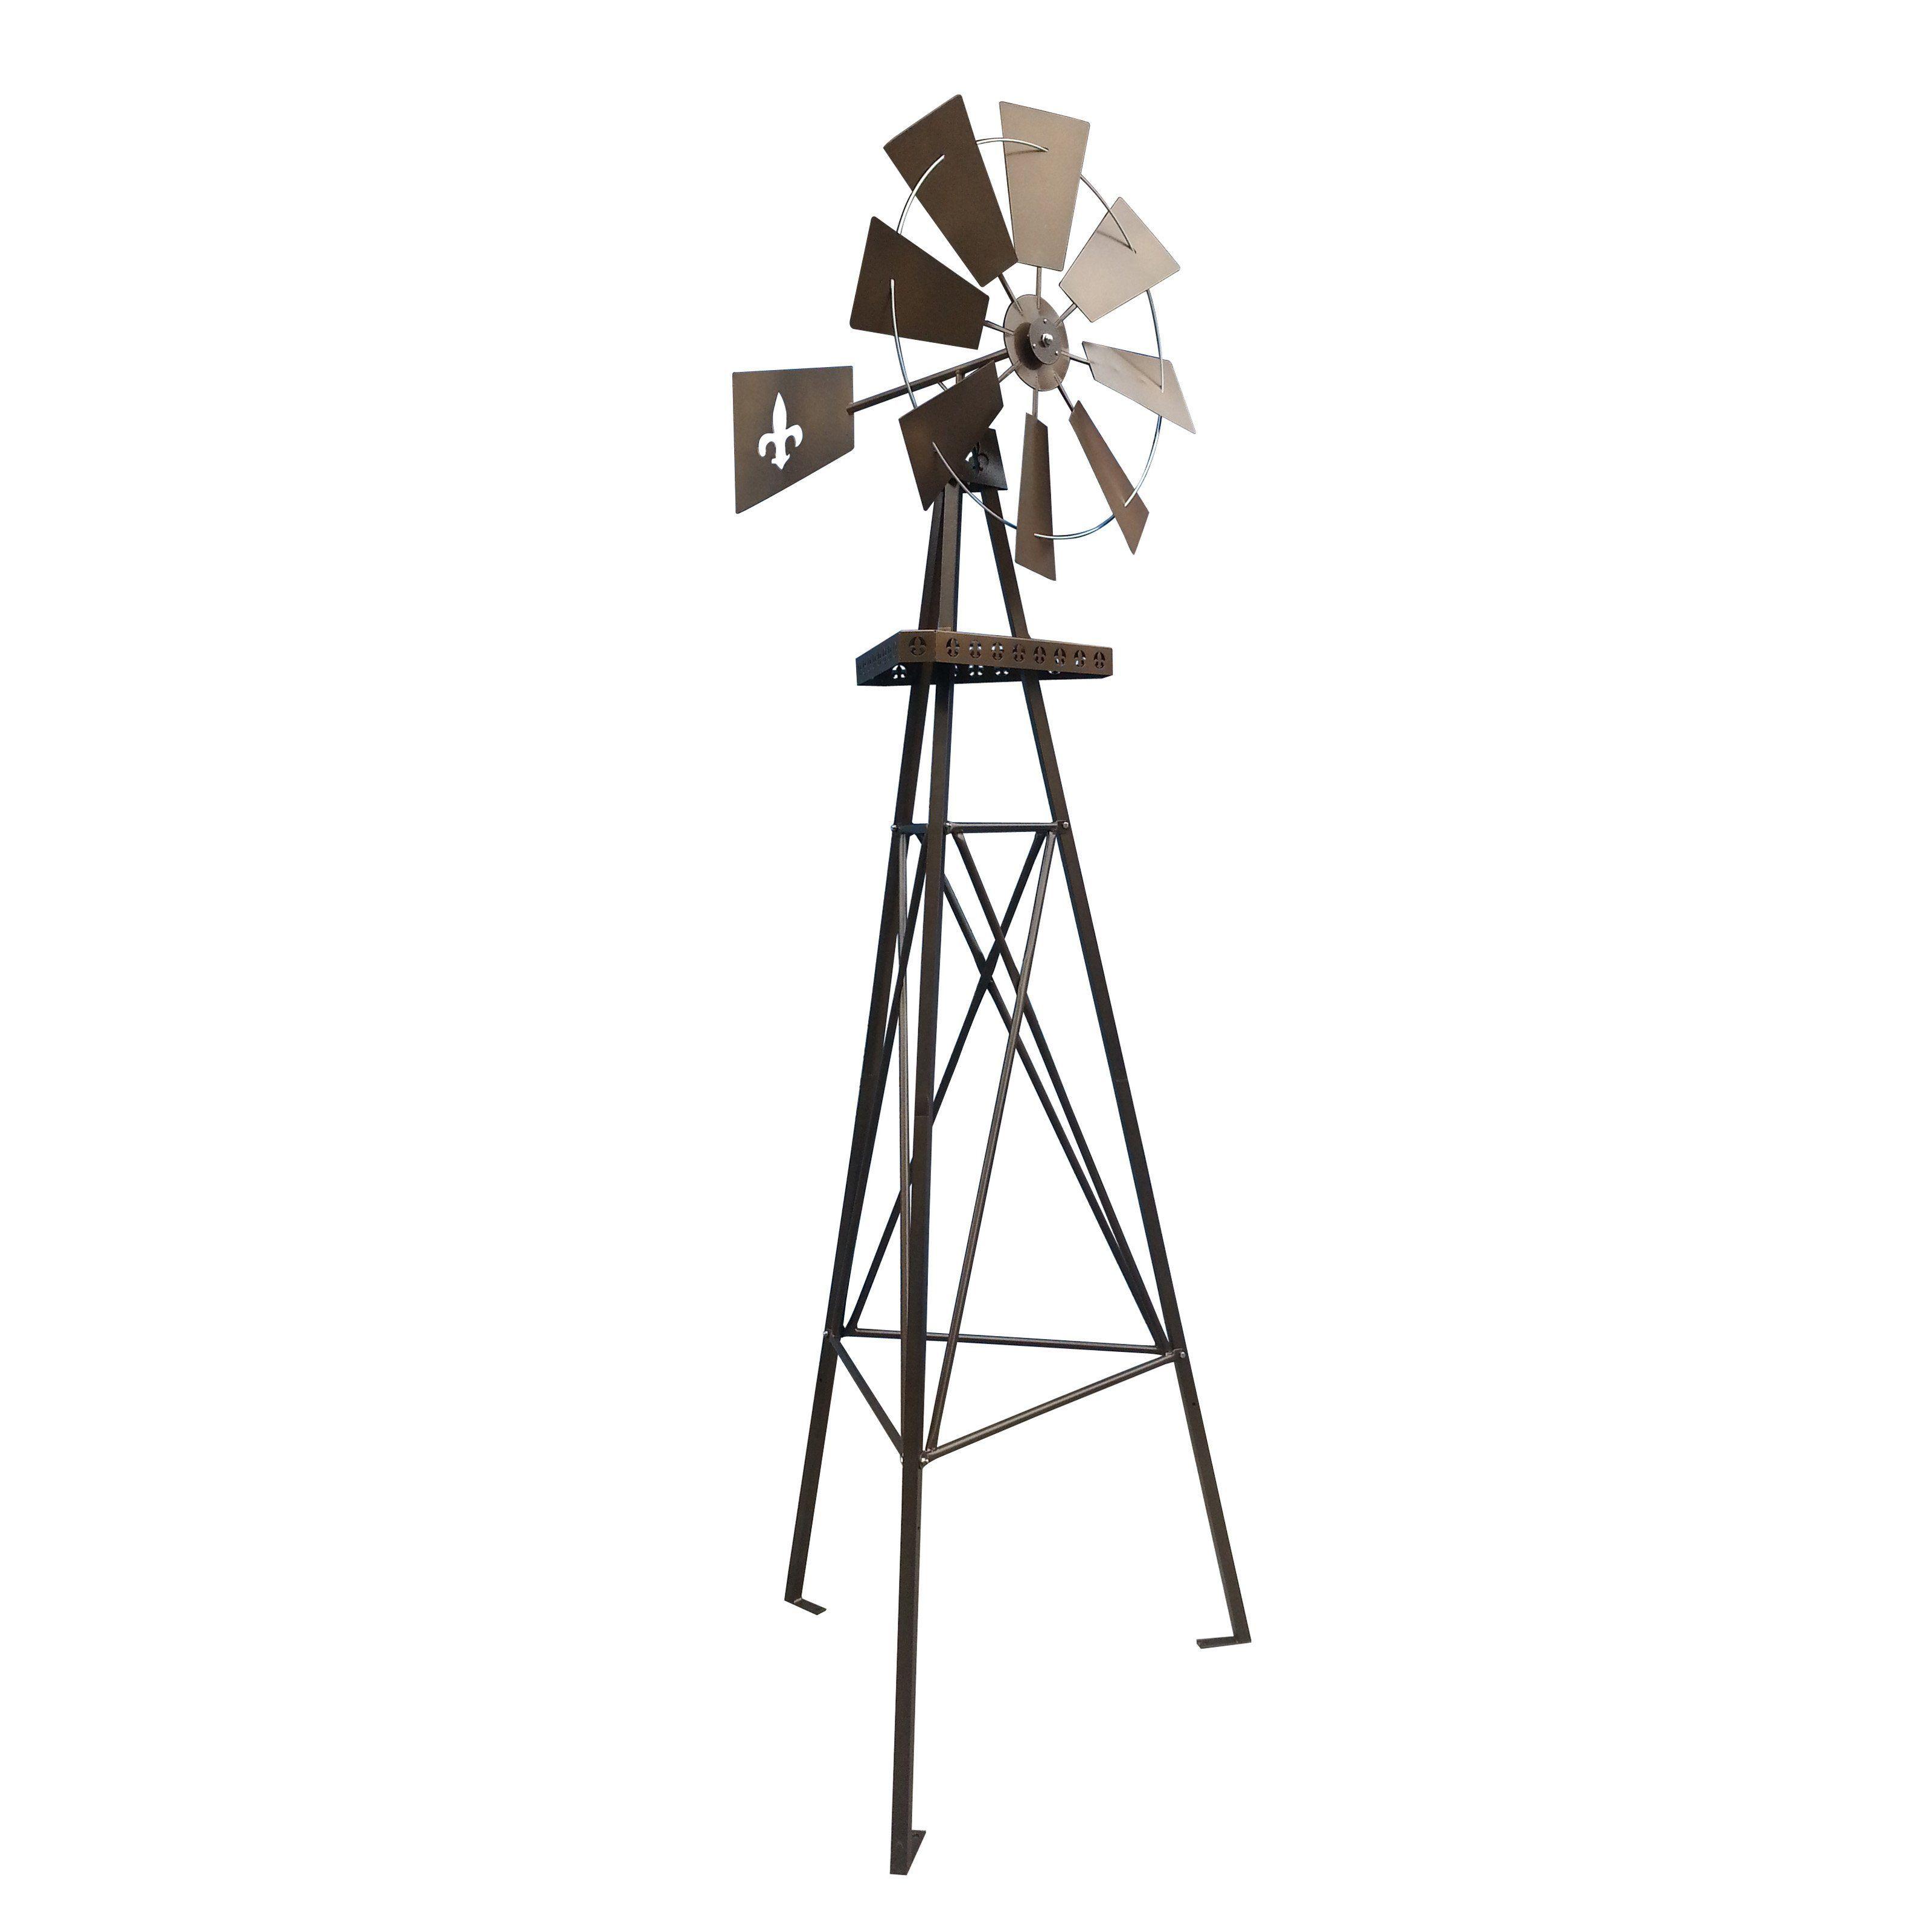 Leigh Country 9 ft. Metal Tripod Fleur De Lis Windmill - TX 93472